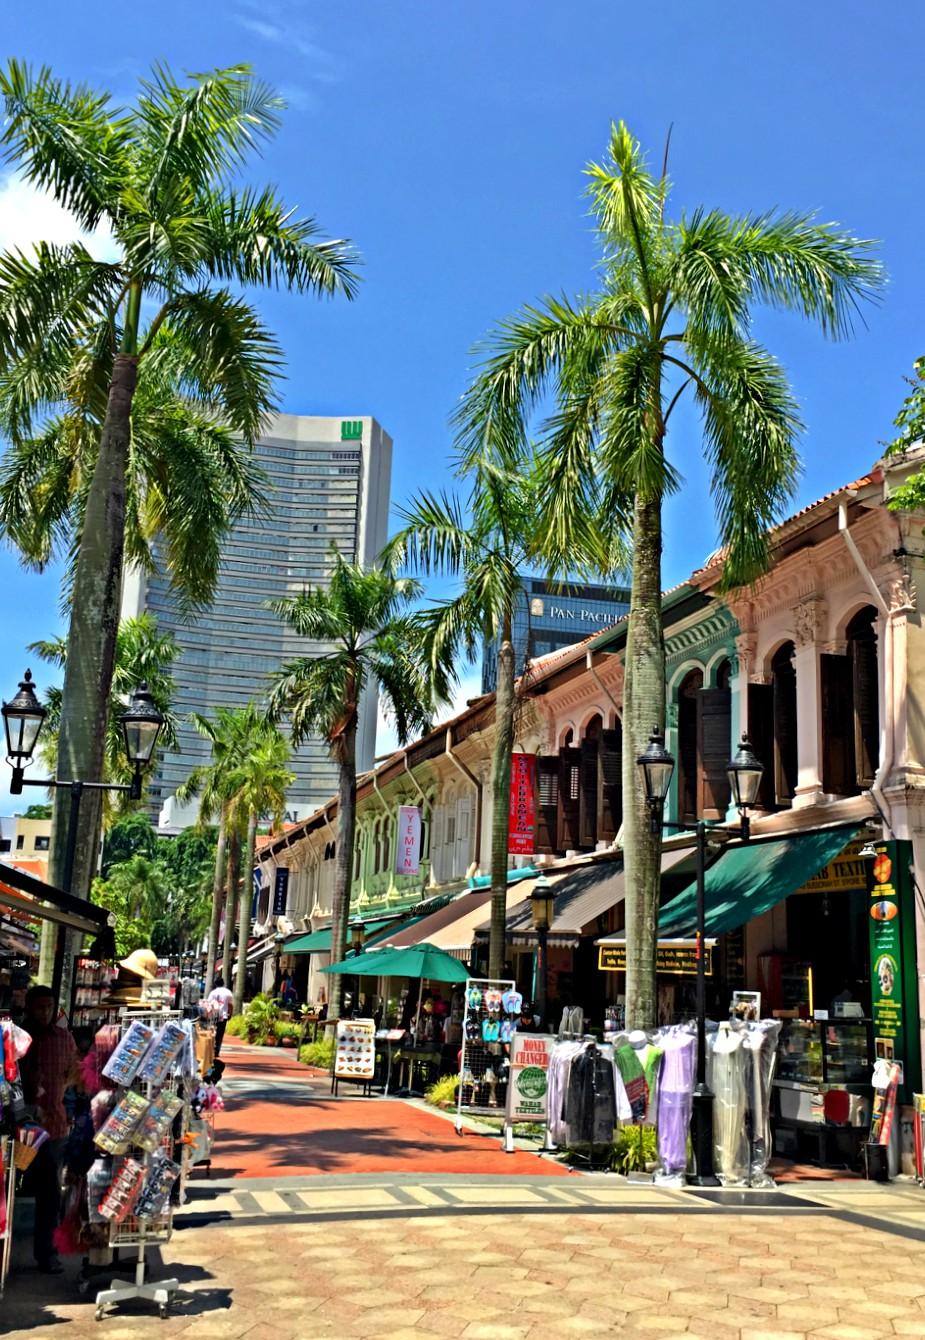 Arab Street shops